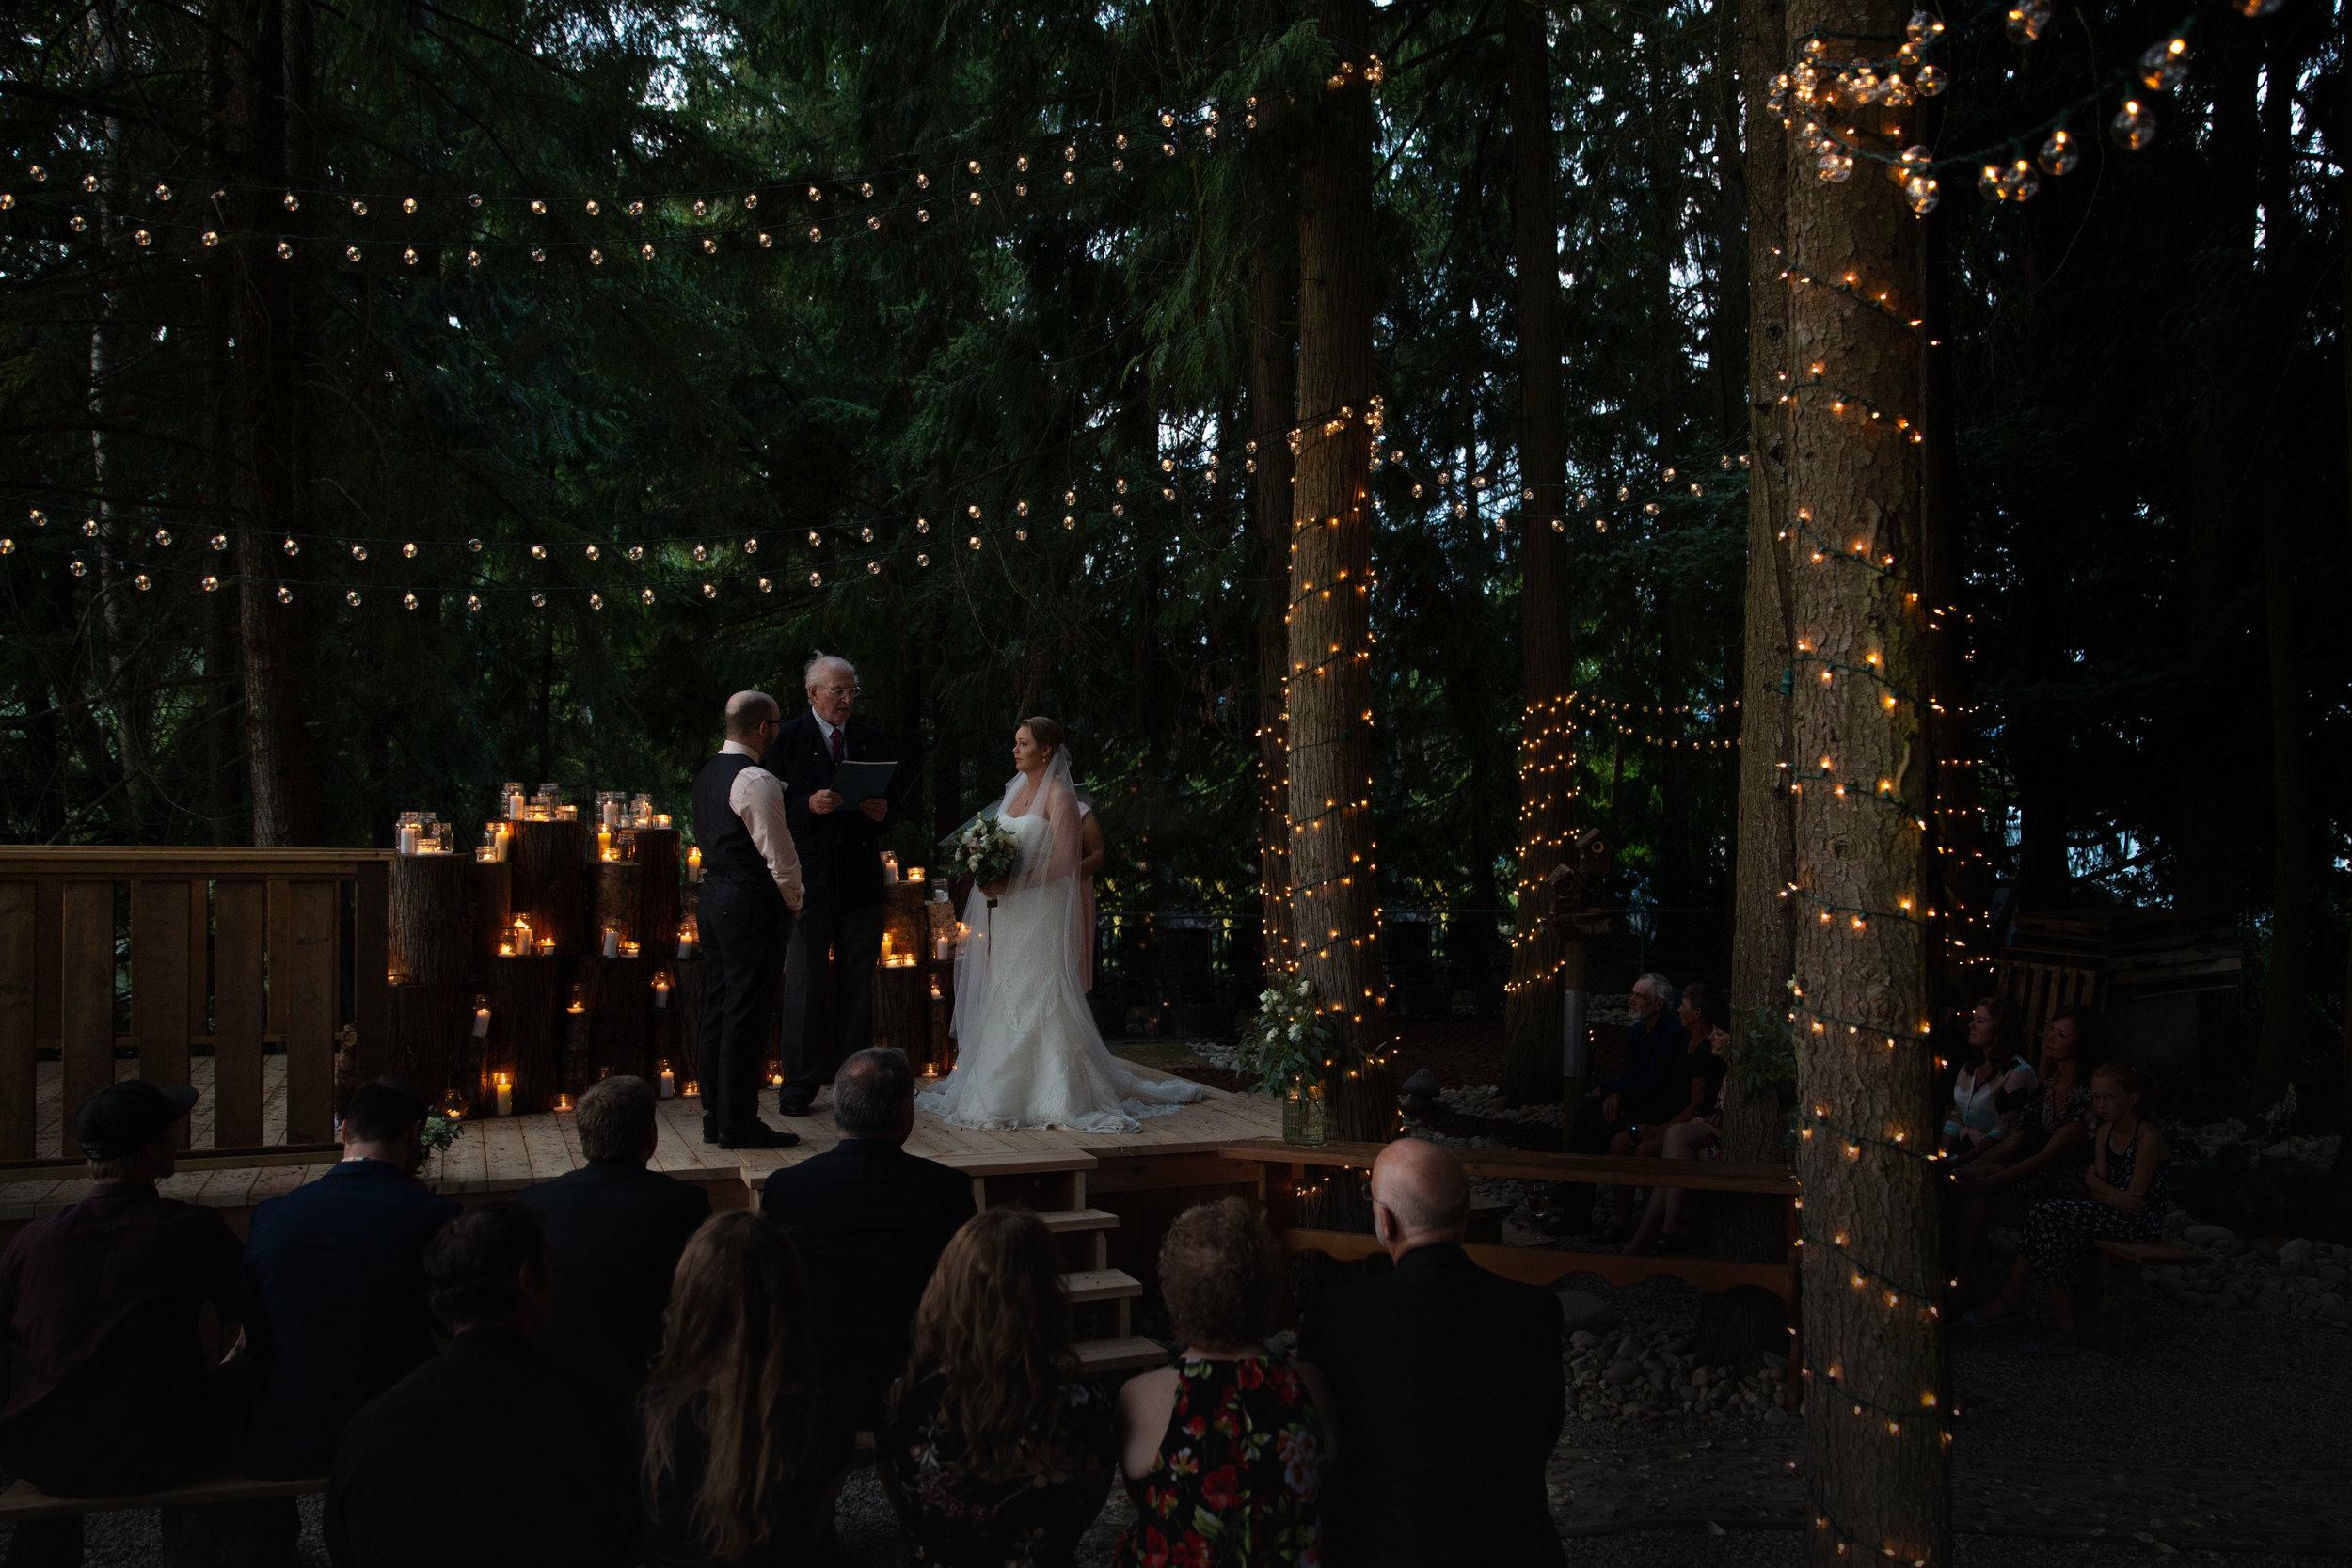 Brandy & Steven backyard wedding pictures in Sicamous British Columbia.